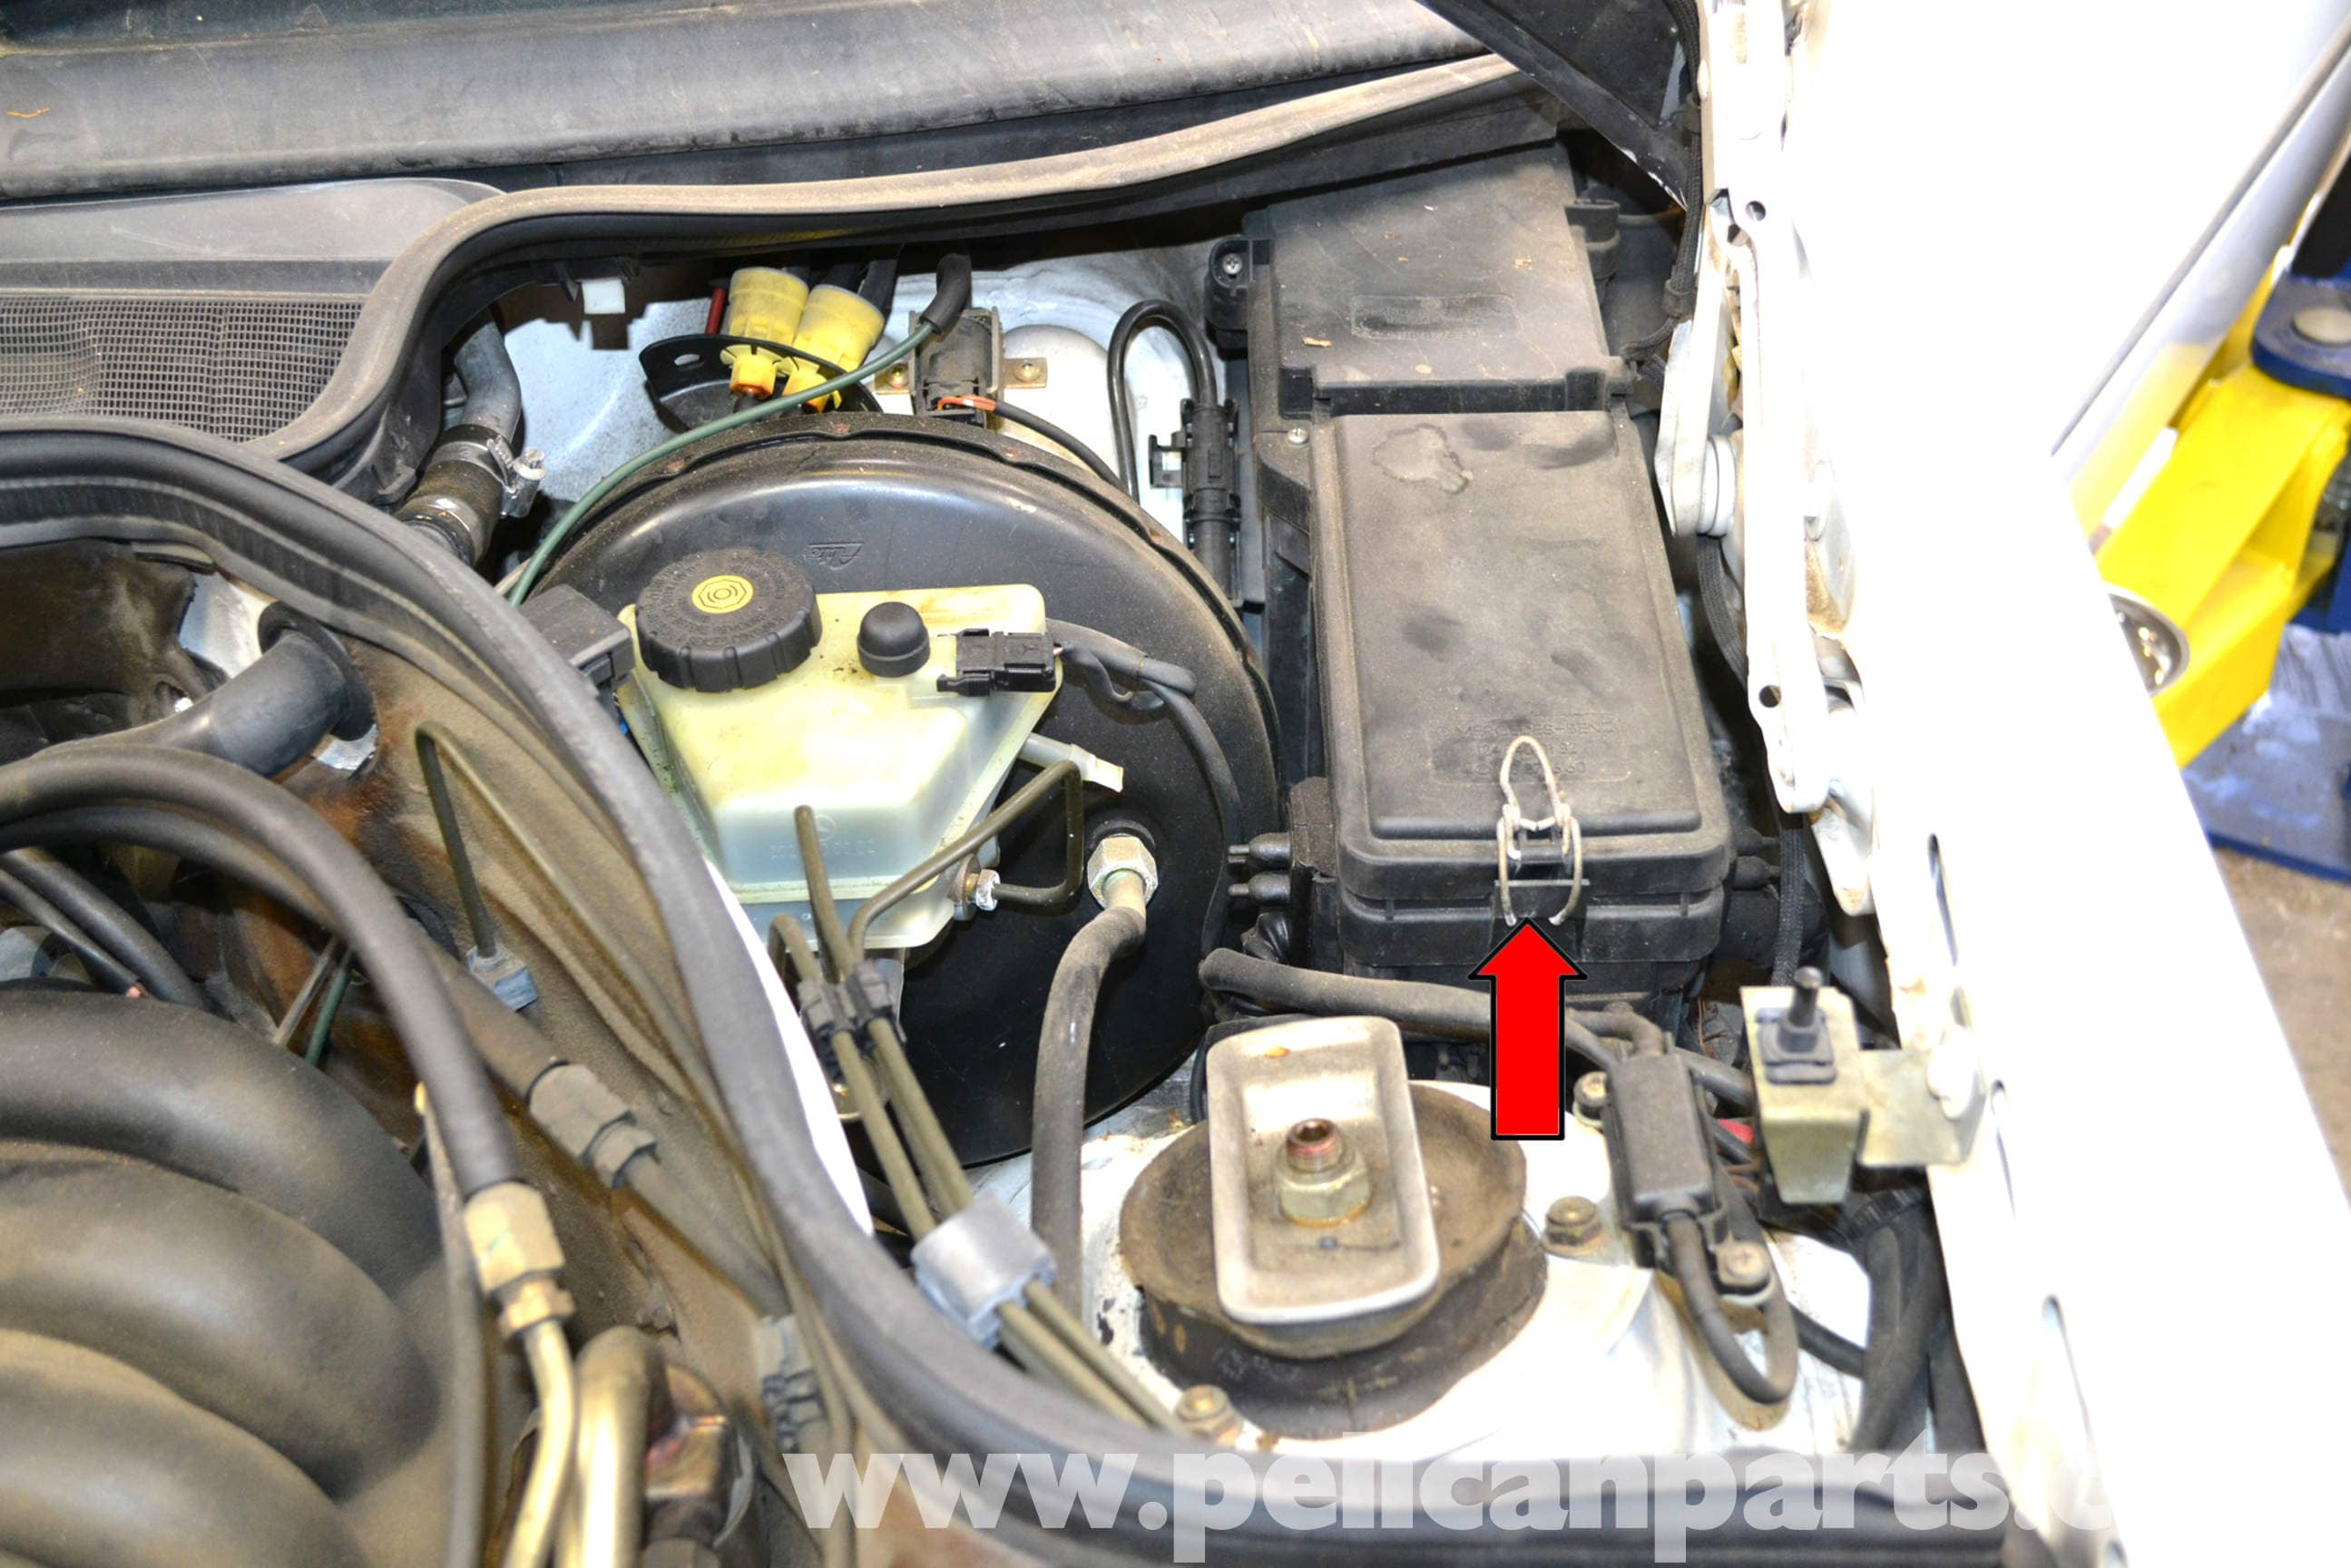 300e Fuse Box Reveolution Of Wiring Diagram Vehicle Cover Mercedes Benz W124 Outside Air Temperature Sensor Replacement 1986 Rh Pelicanparts Com 1990 Circuit Breaker